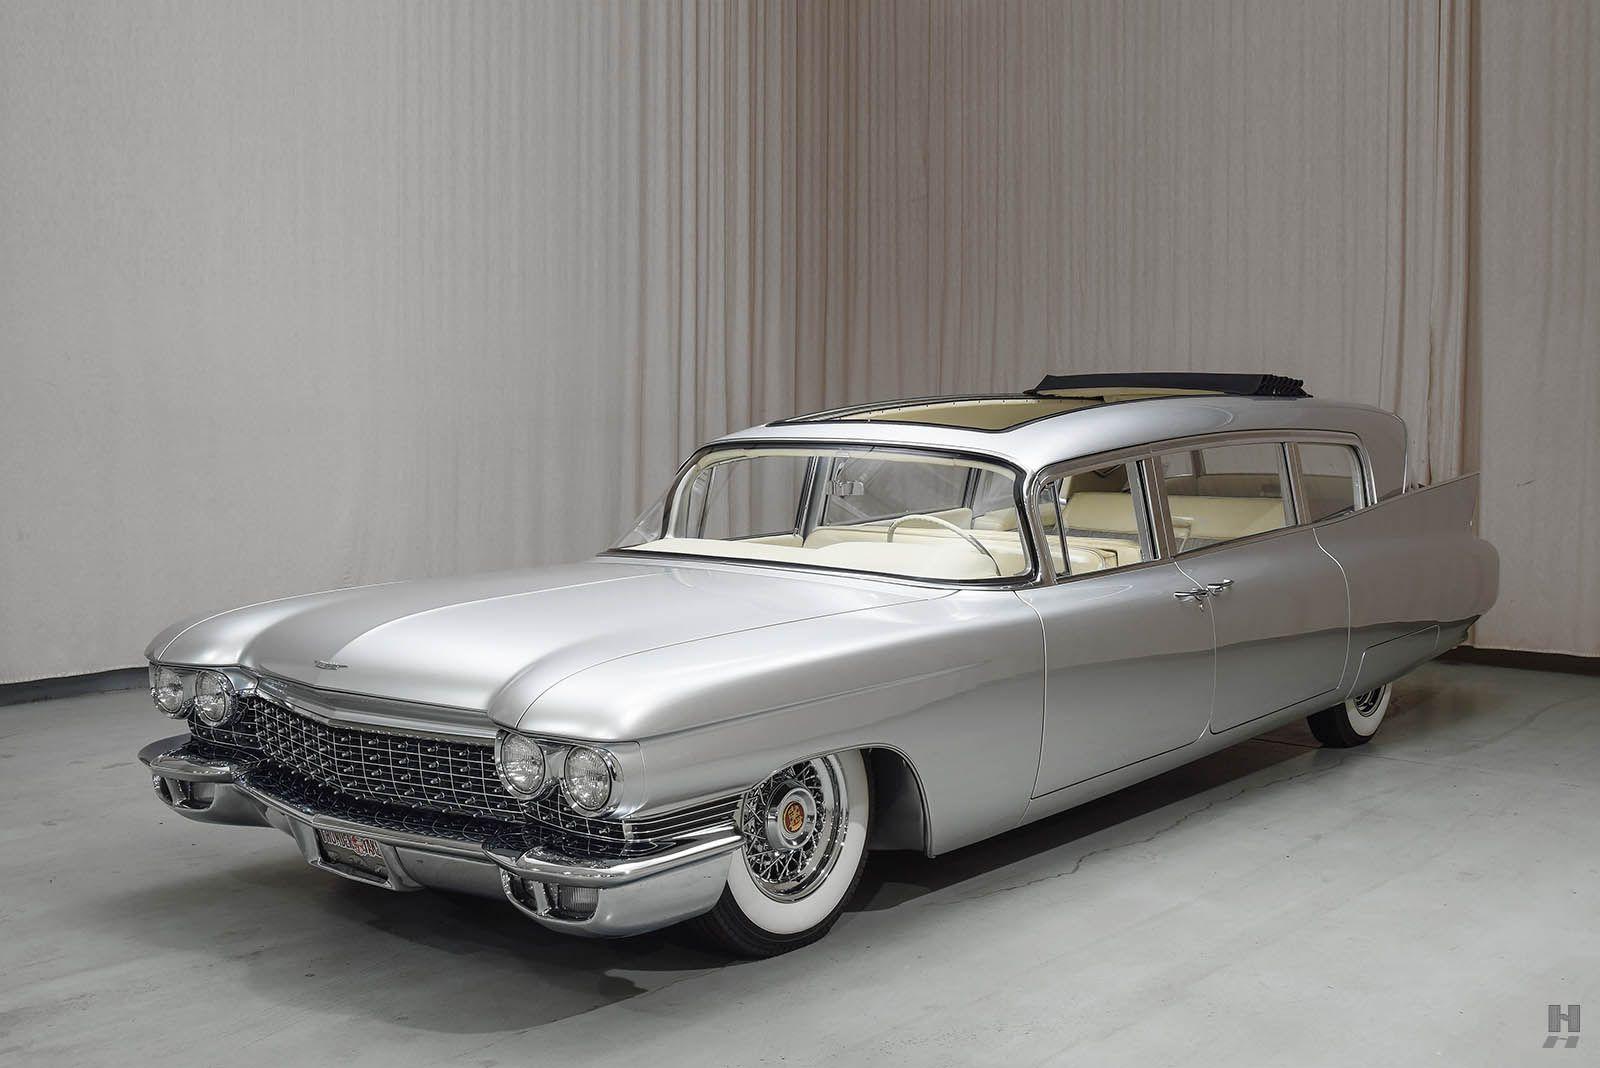 1960 Cadillac Fleetwood Custom Limo - Hyman Ltd. Classic Cars ...